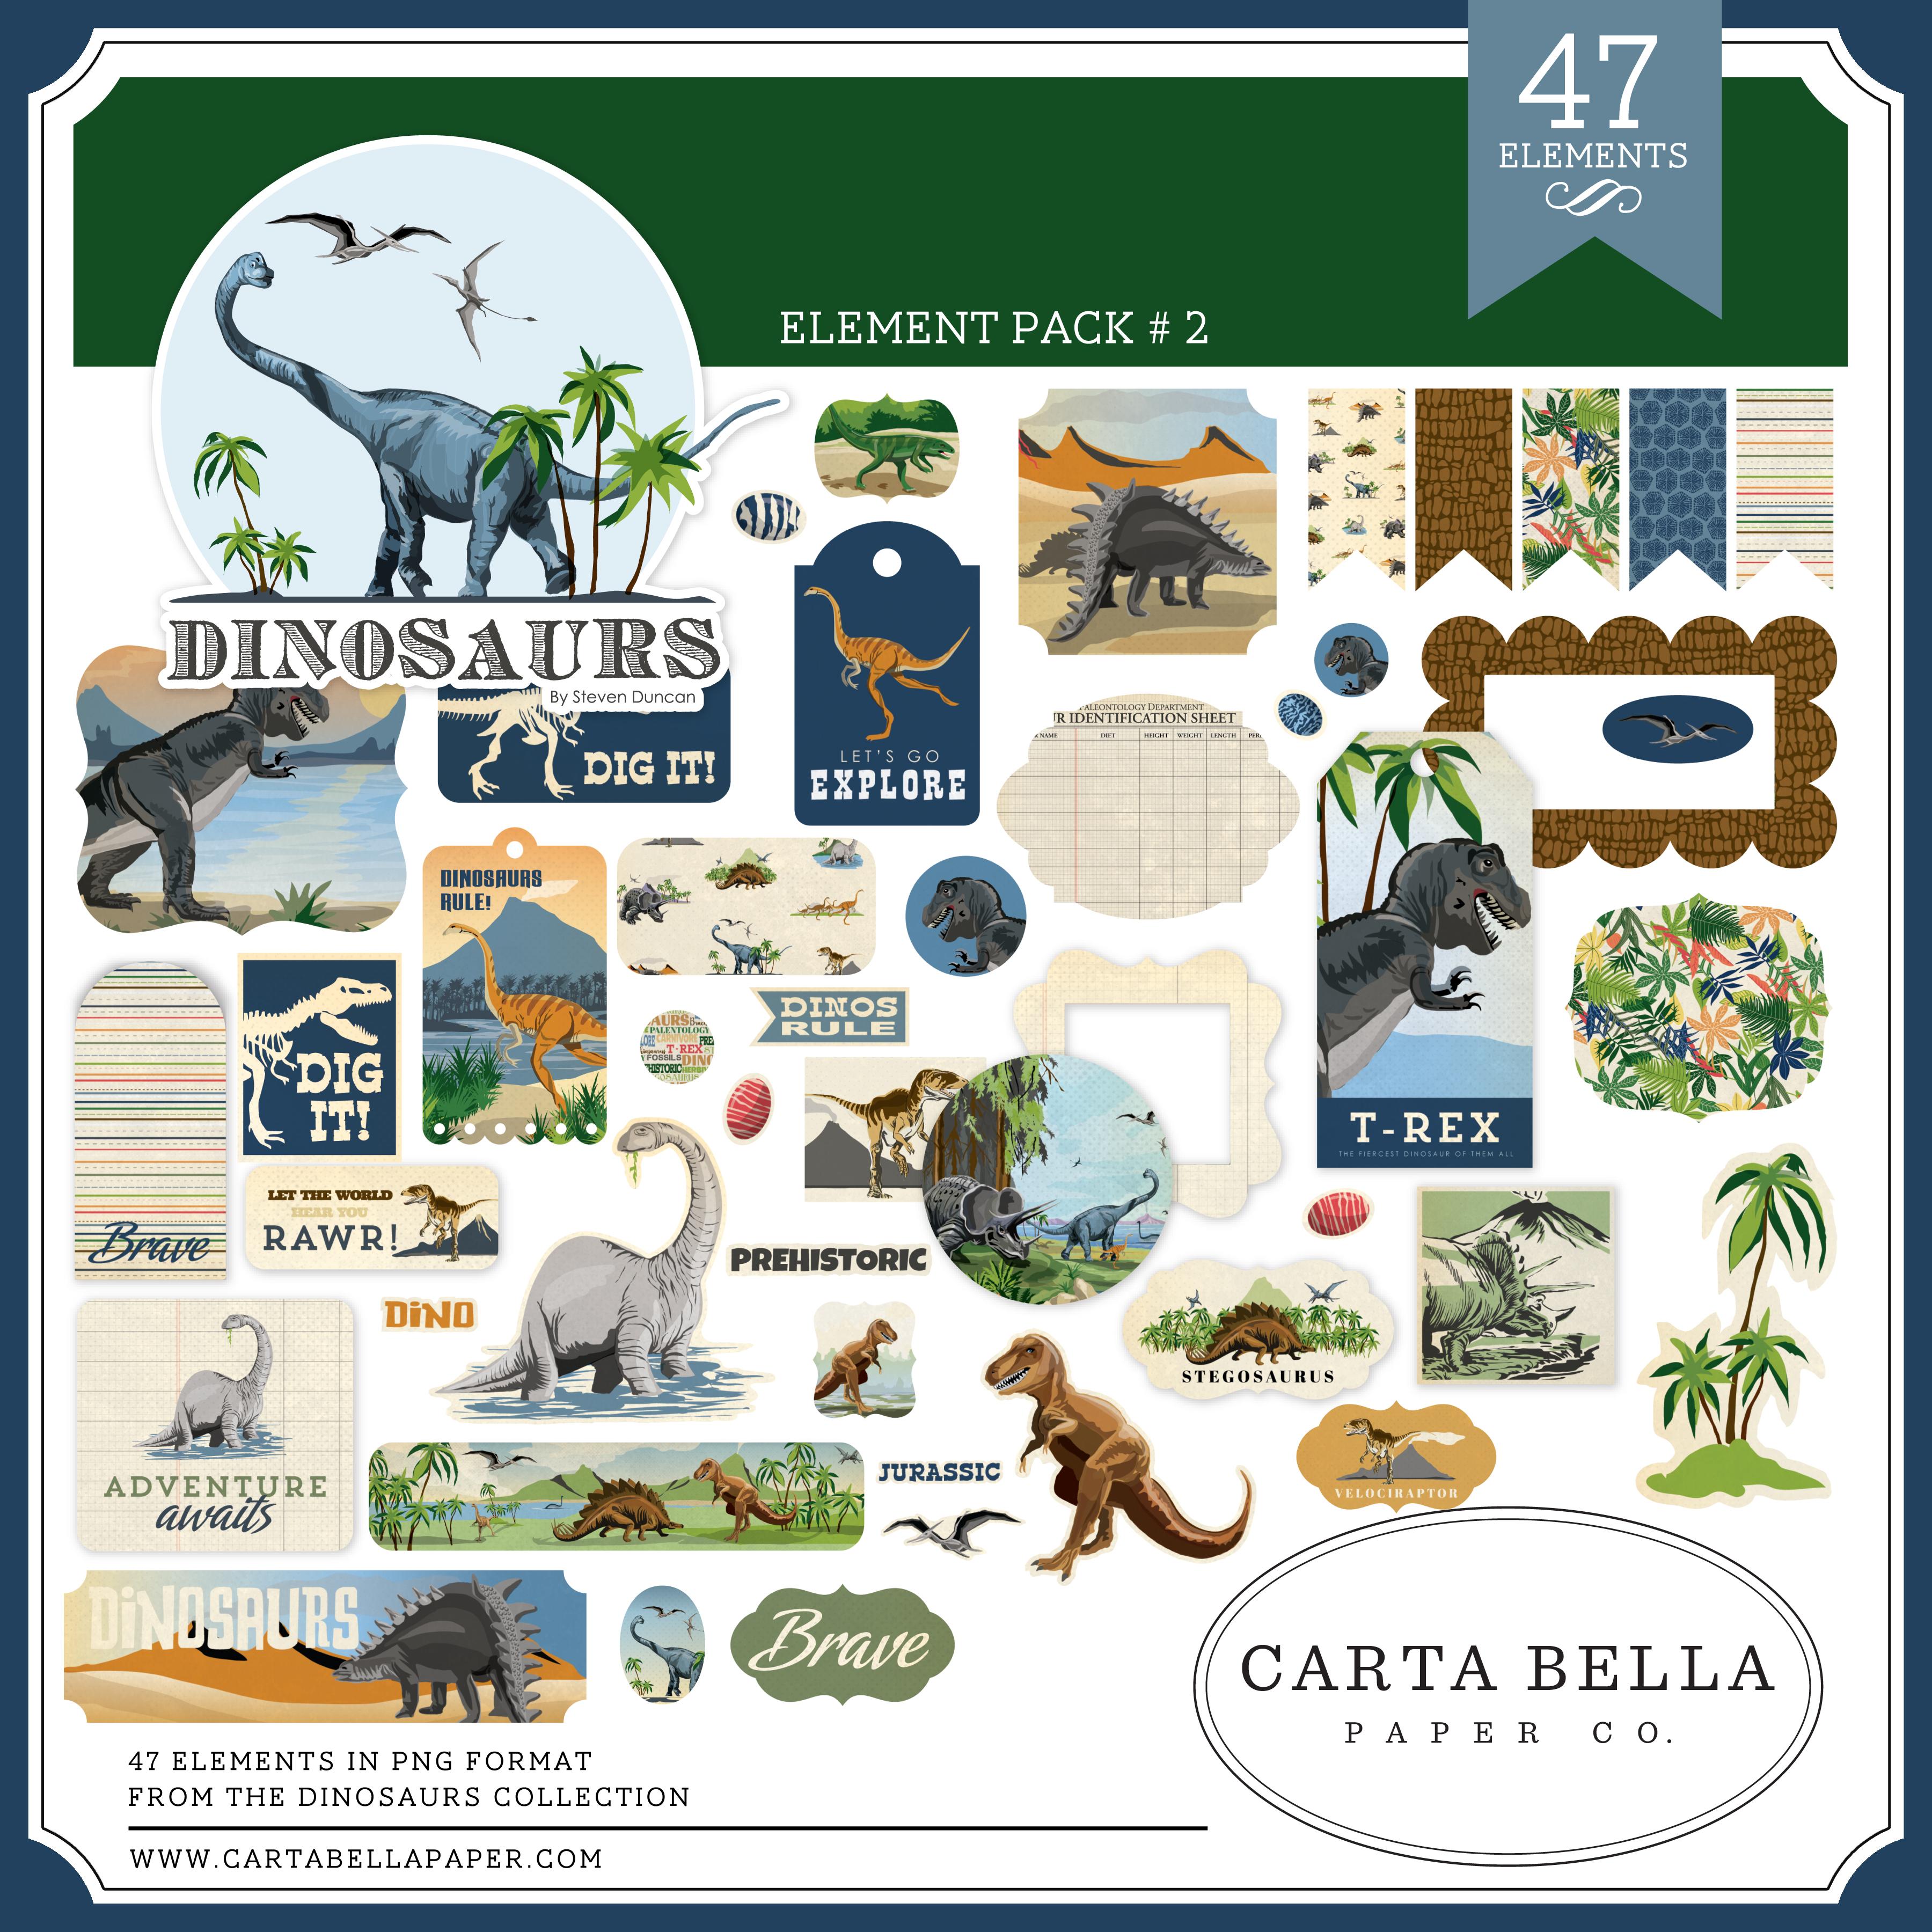 Dinosaurs Element Pack #2